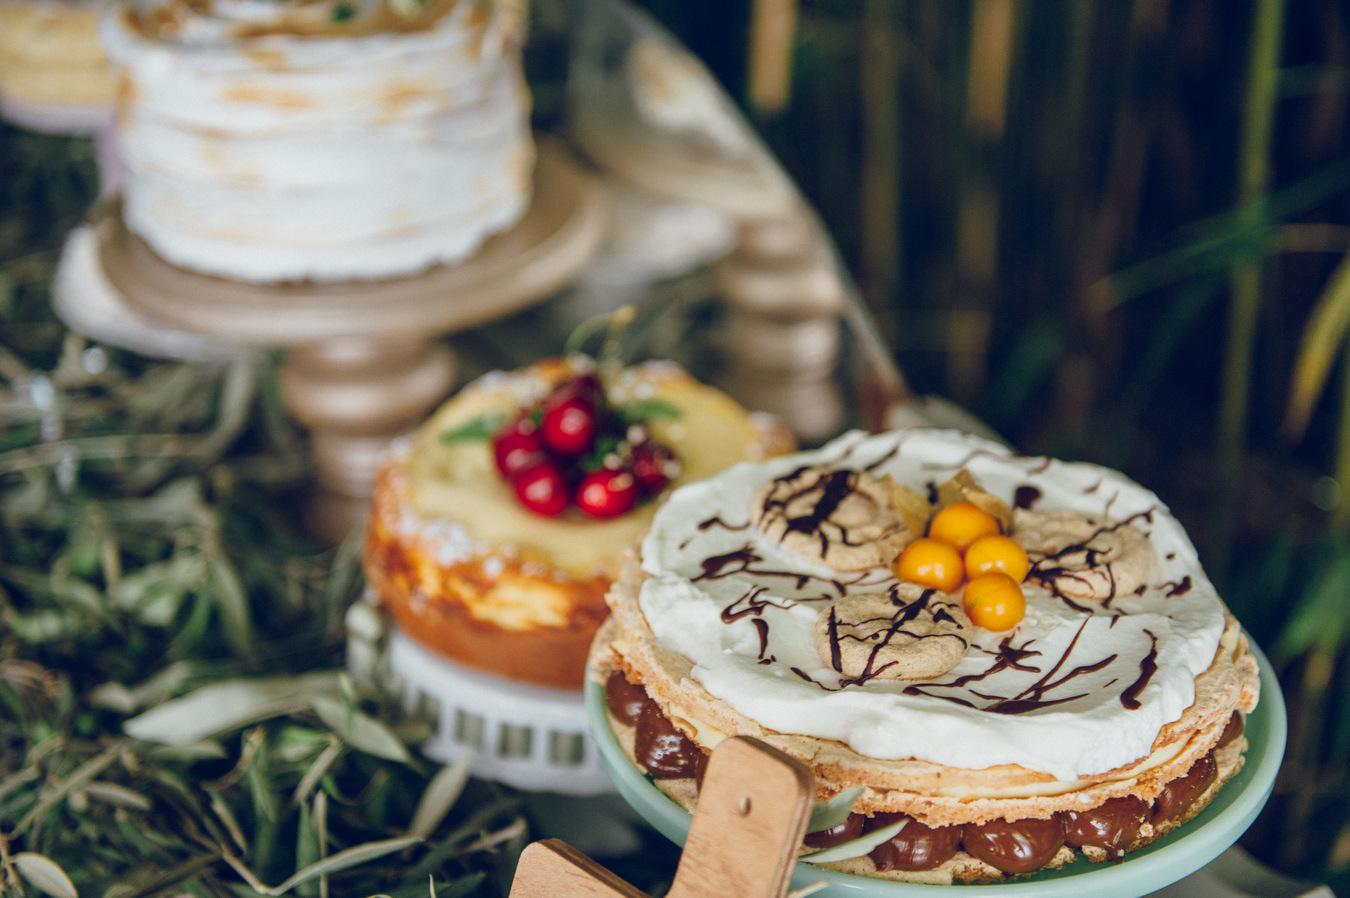 calista-one-lista-de-bodas-online-blog-de-bodas-calista-one-summer-party-2016-tartas-bodas-2